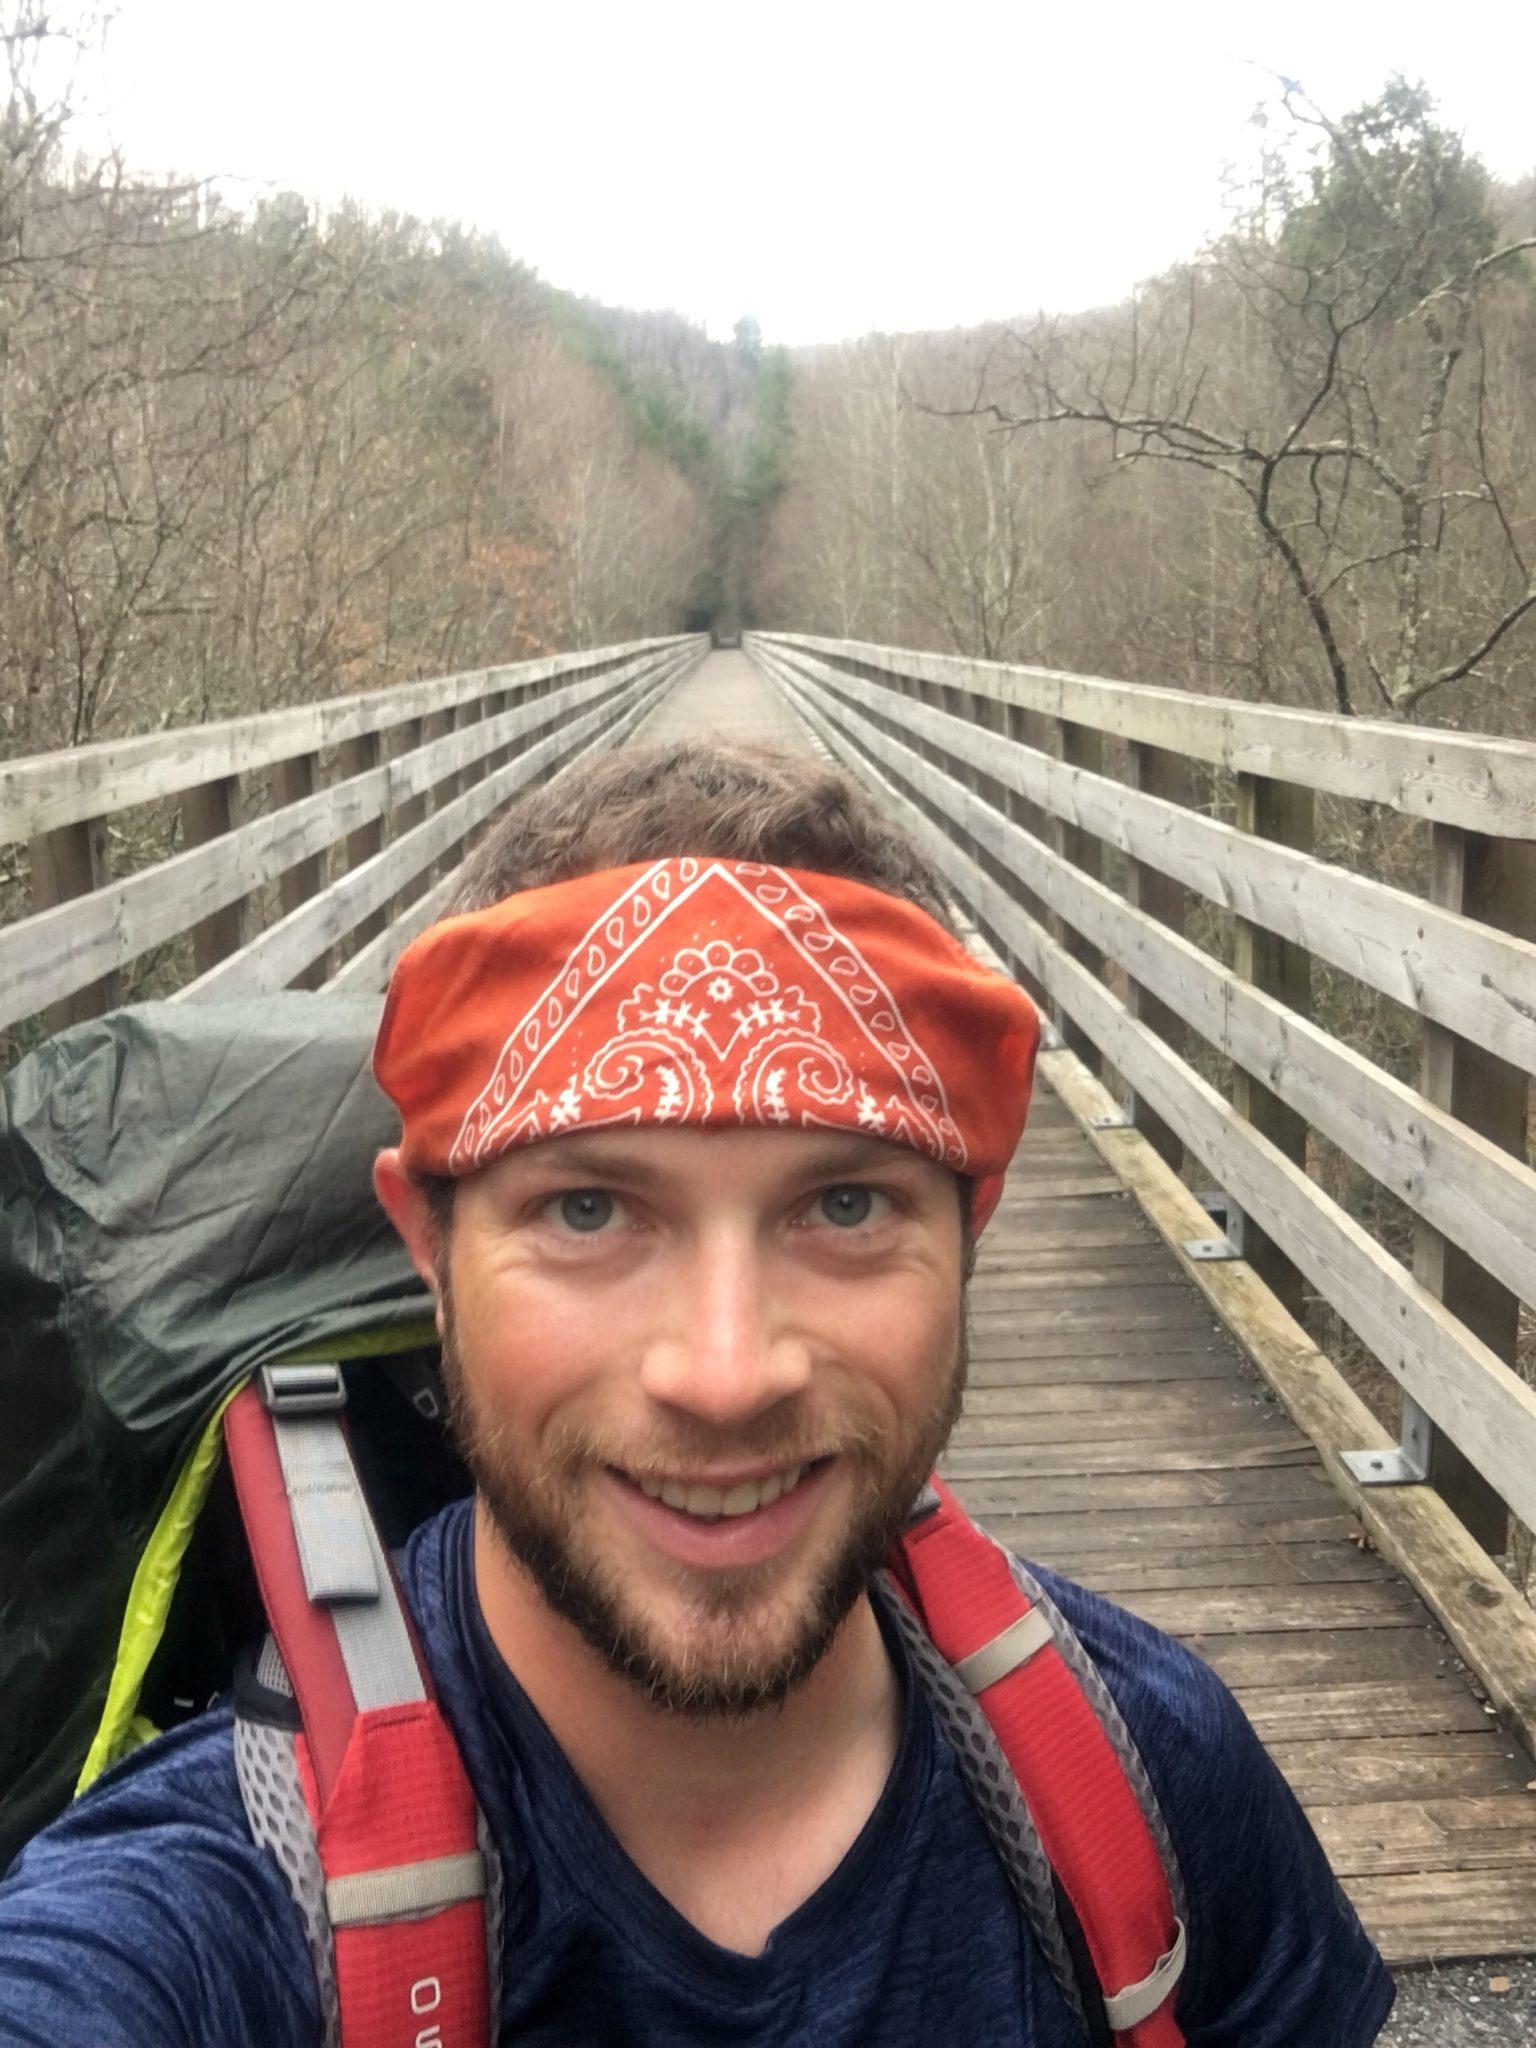 Crossing a bridge on the Virginia Creeper Trail